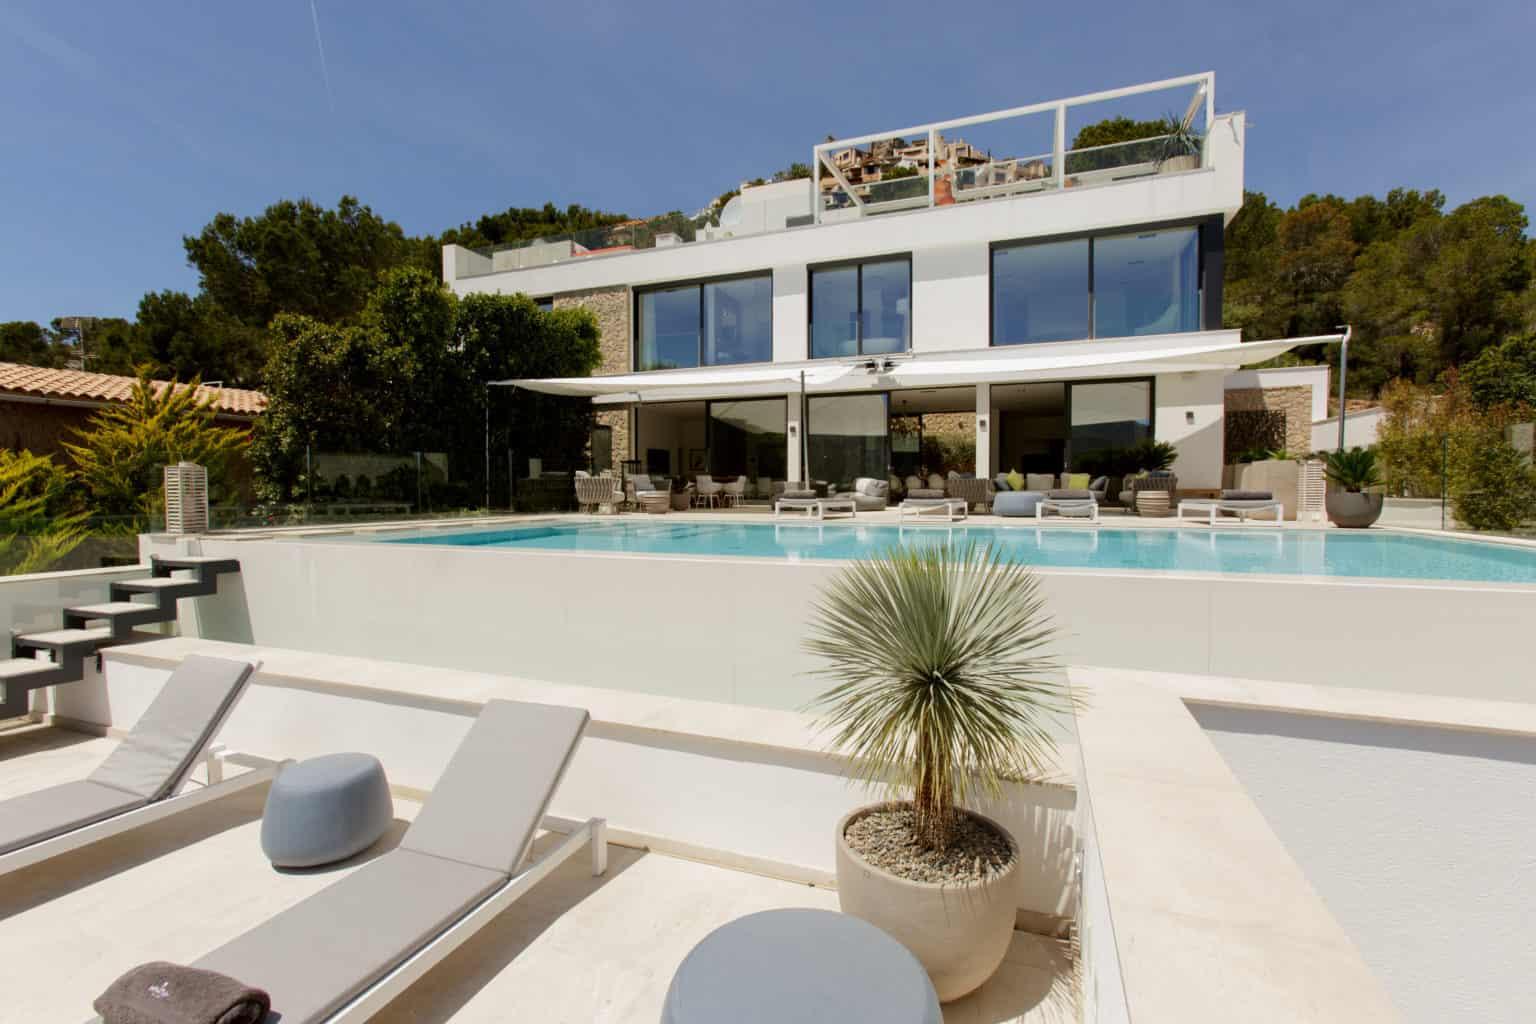 Villa-Rental-Mallorca-5-Bedrooms-Balearic-Bliss-Villa-Infinitum-Port-Andratx